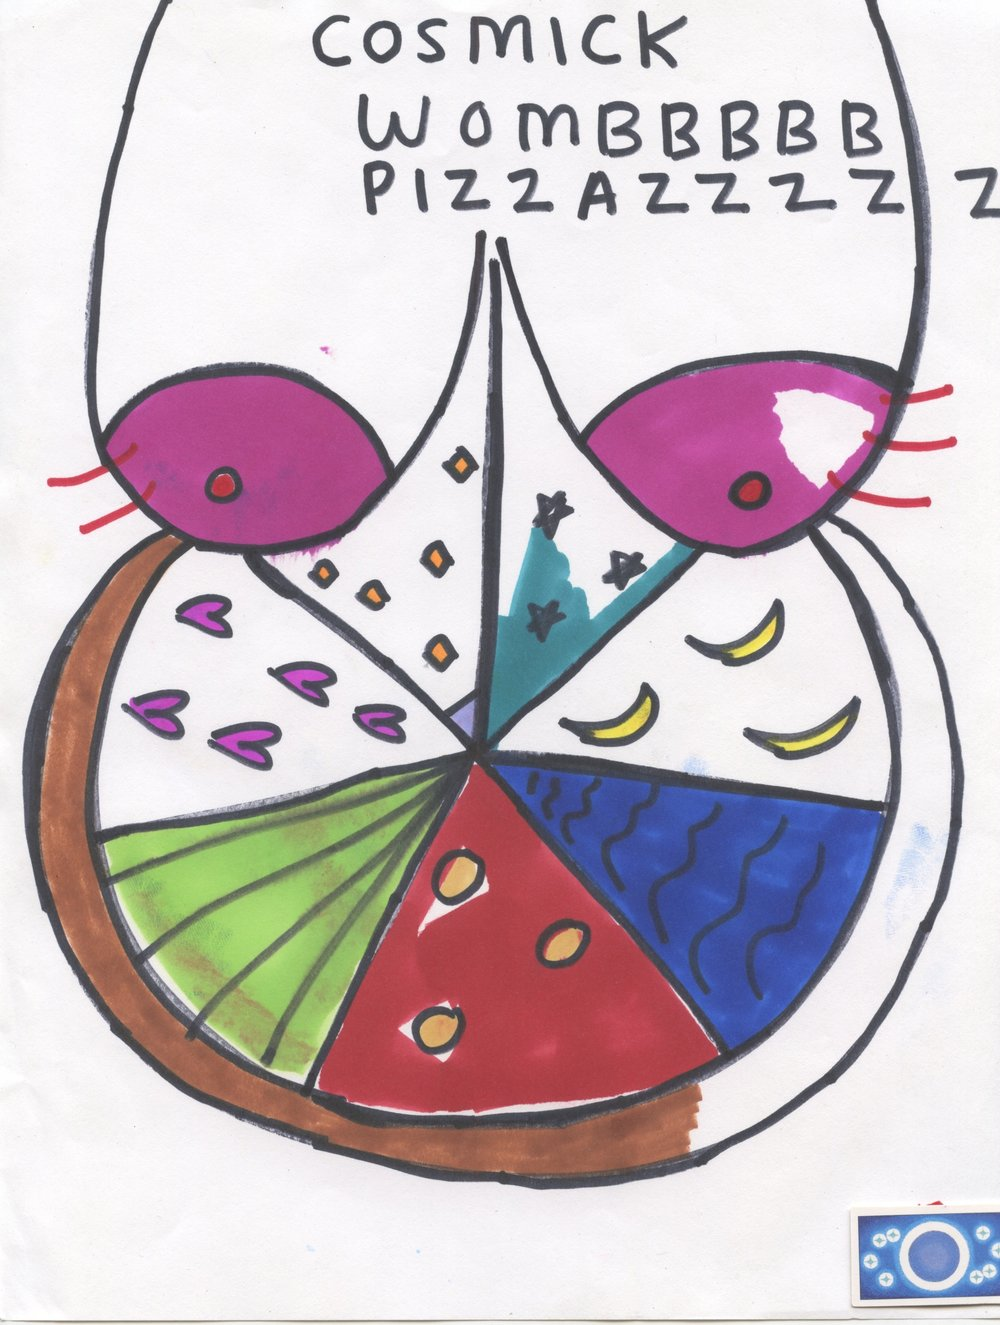 Cosmick Womb Pizza.jpeg